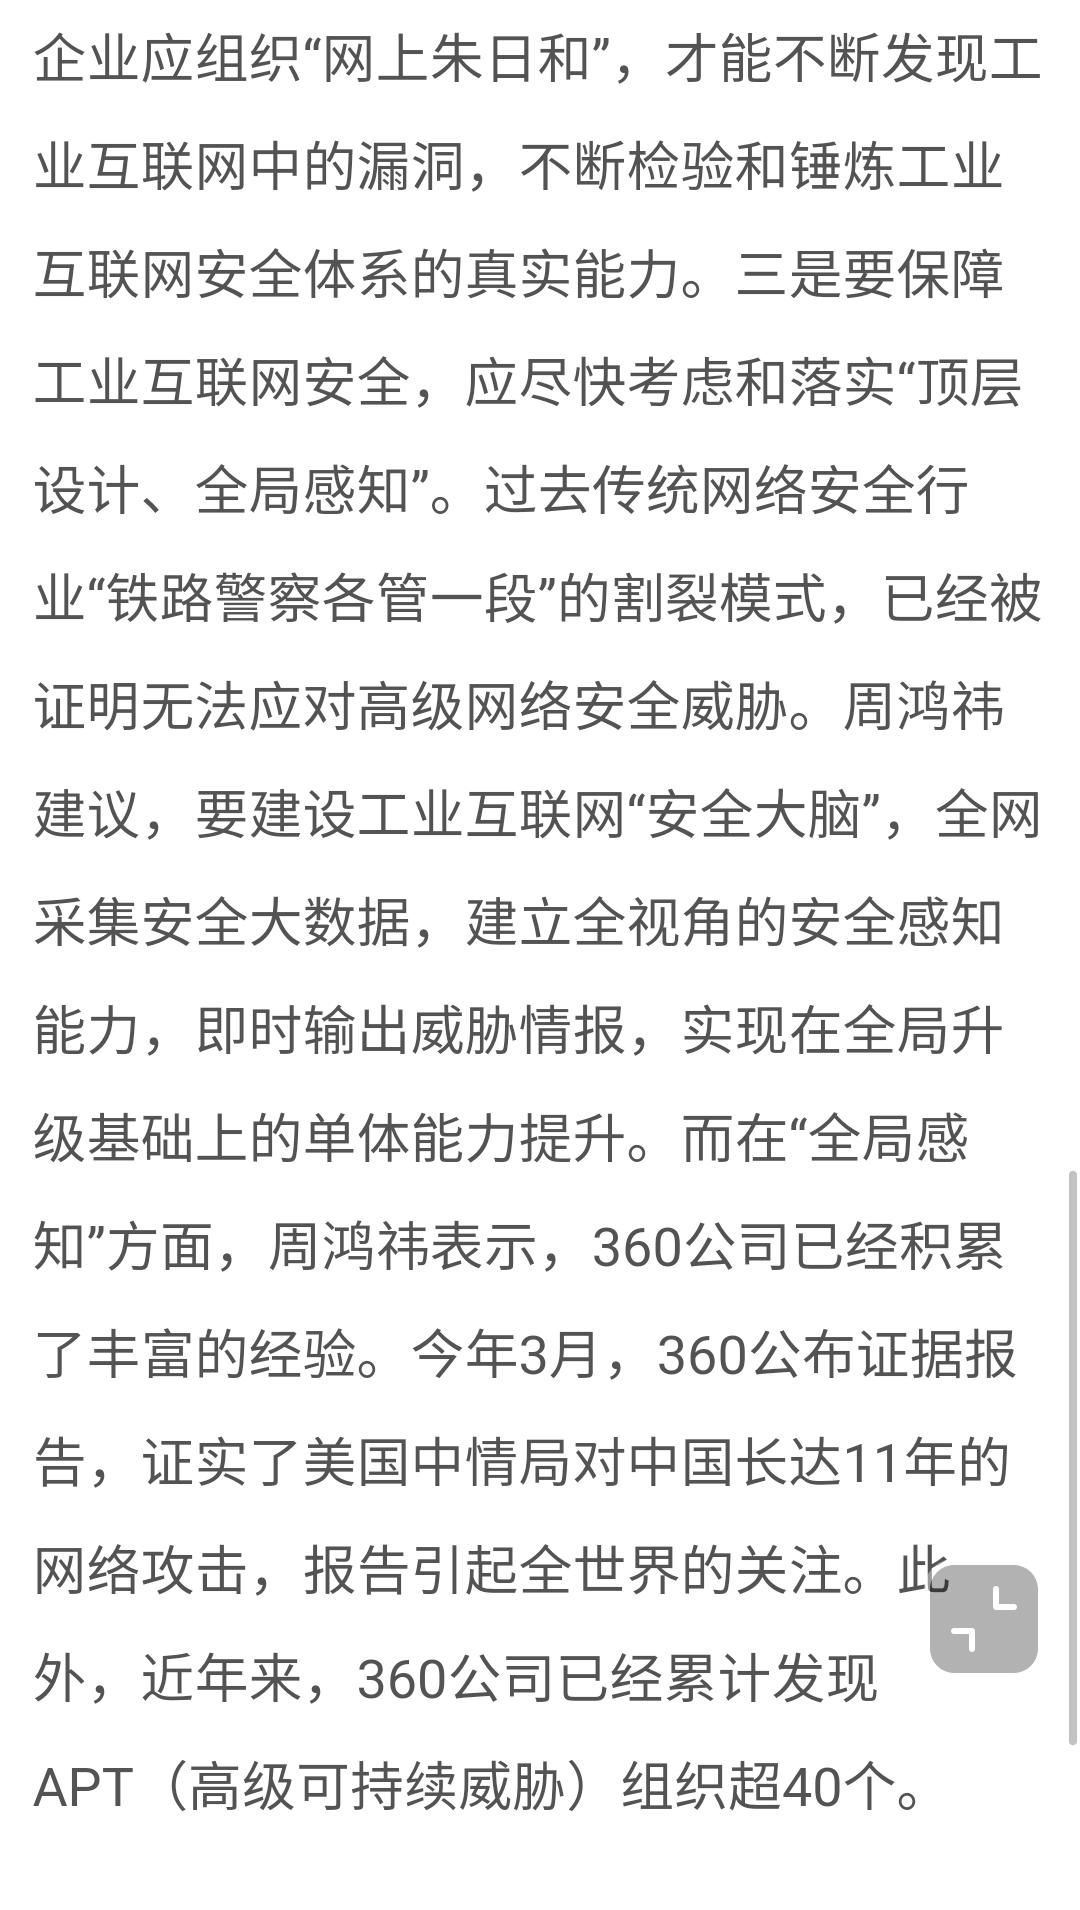 Screenshot_2020-05-23-04-51-58.png